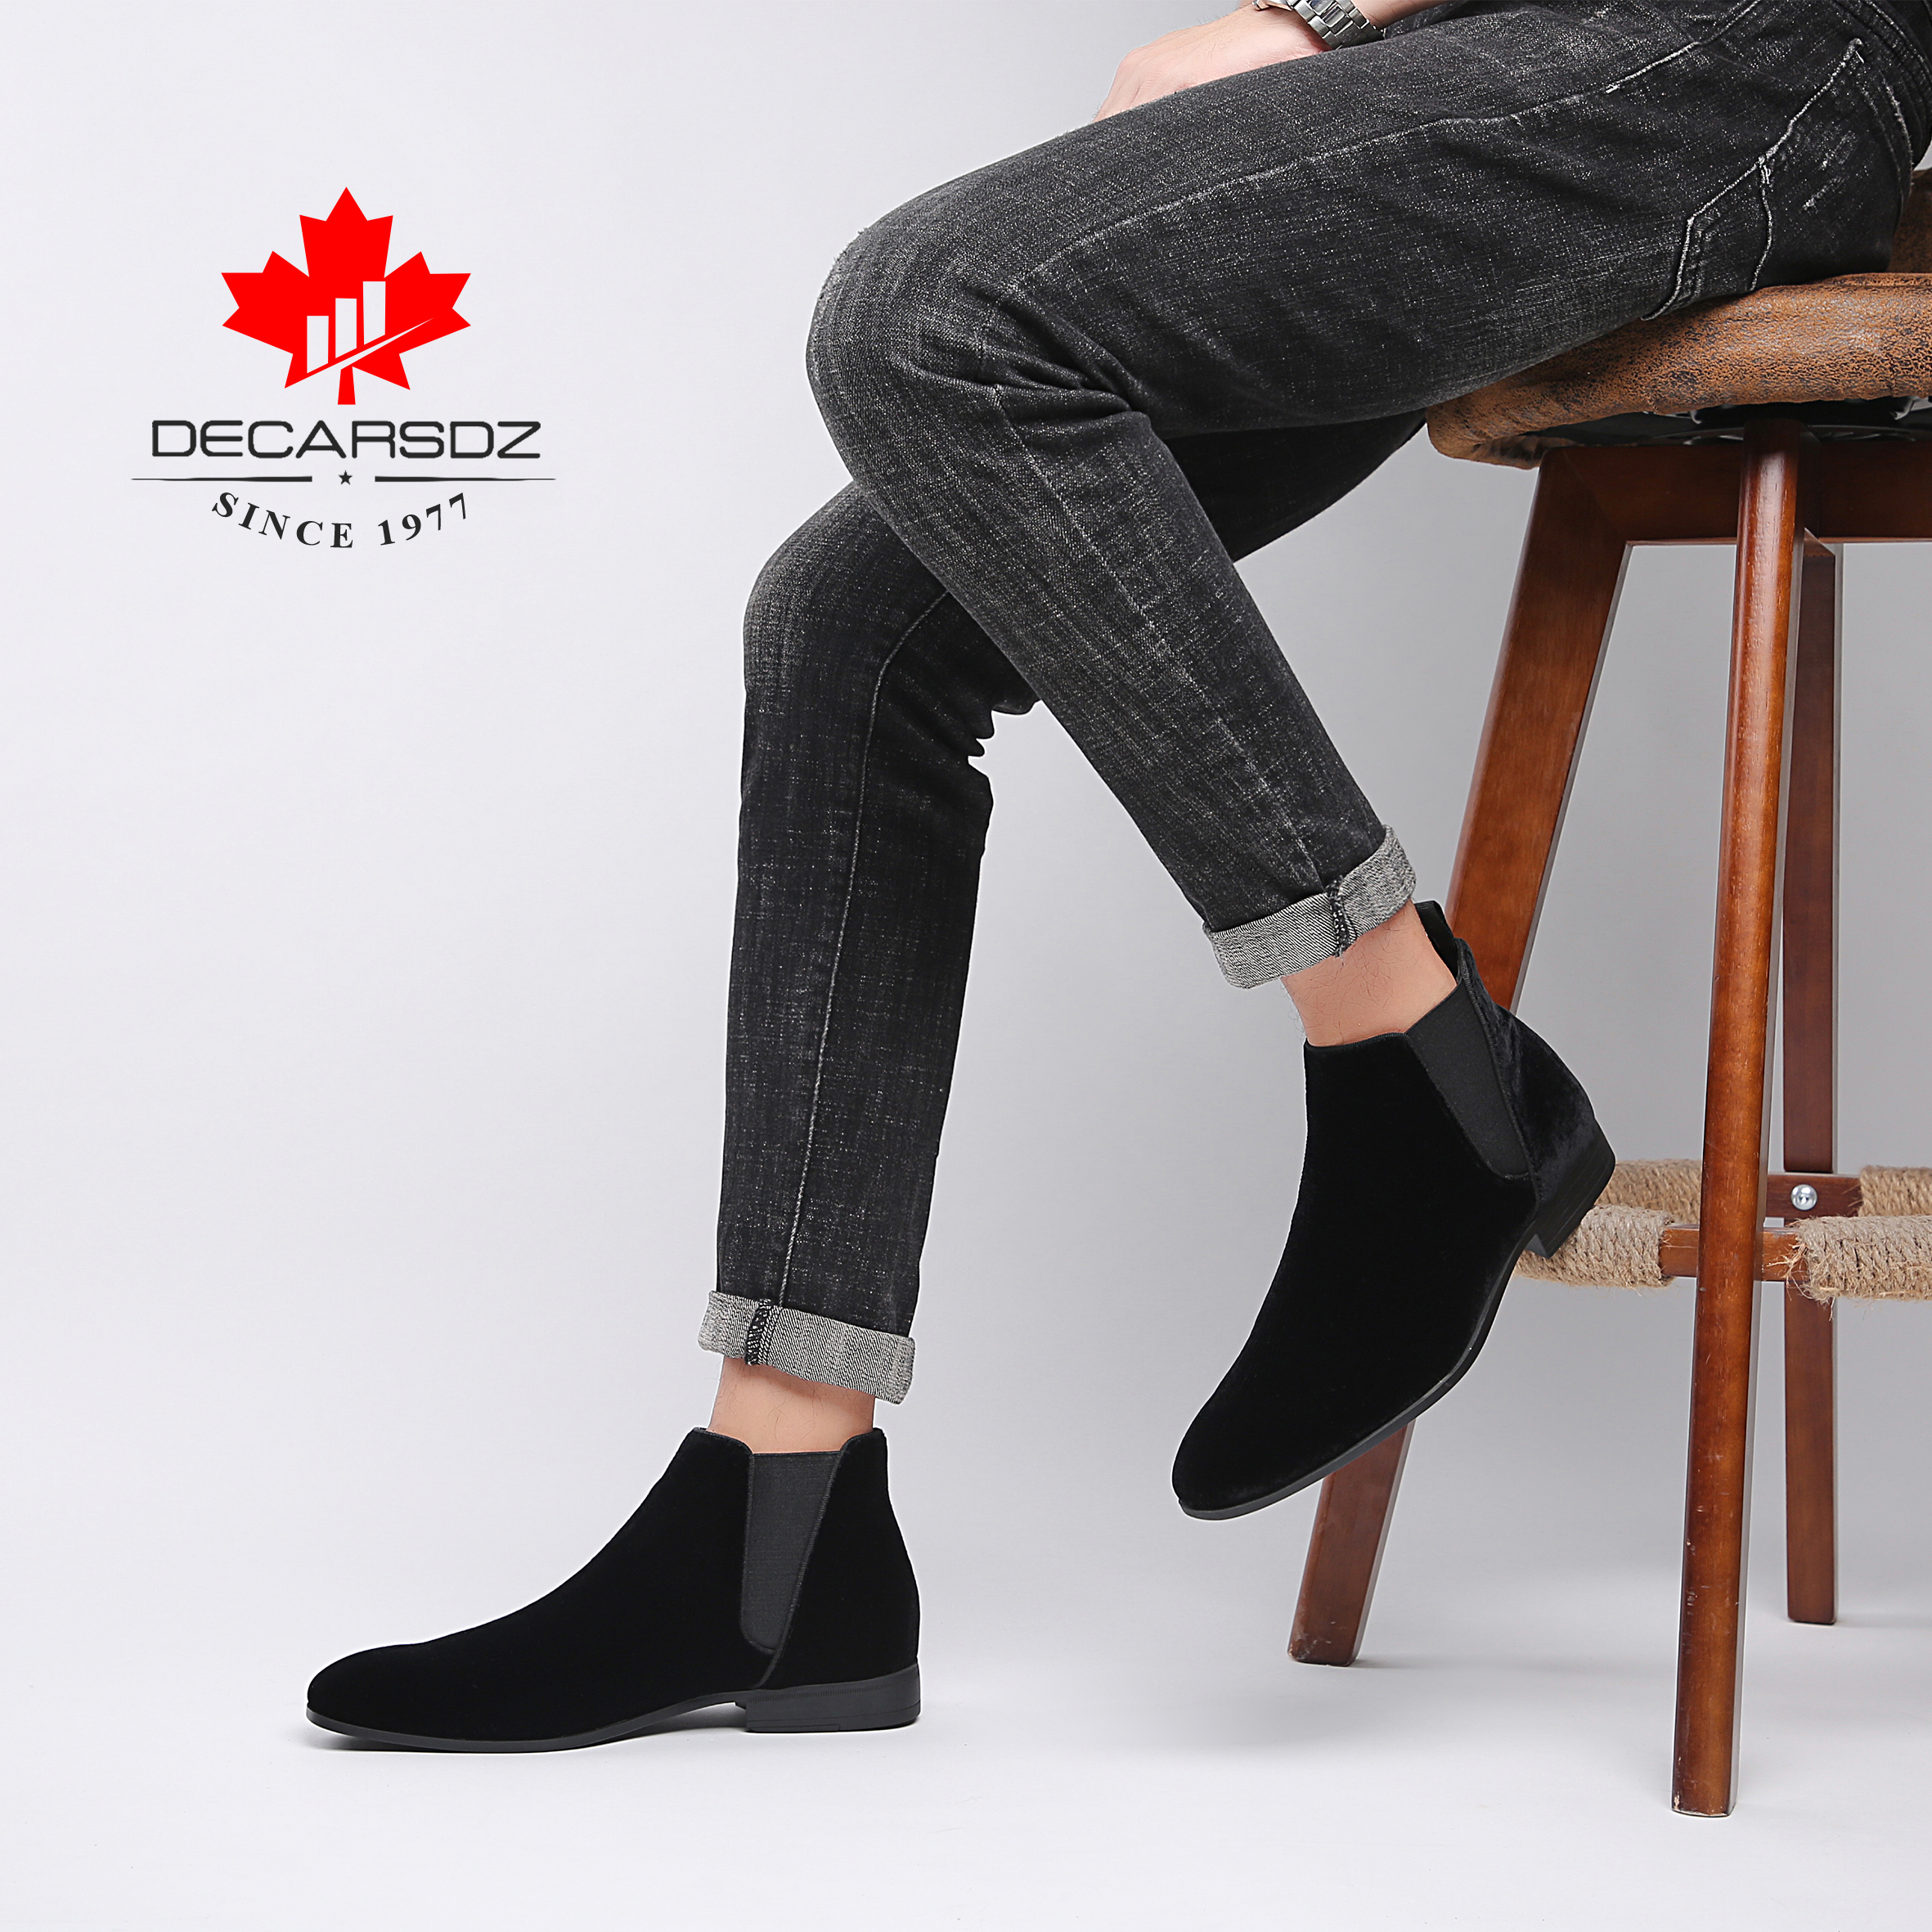 DECARSDZ Men Chelsea Boots Spring Autumn Fashion Shoes Man Comfy Slip-on Casual Boots Men New Original classic design Men Boots 5